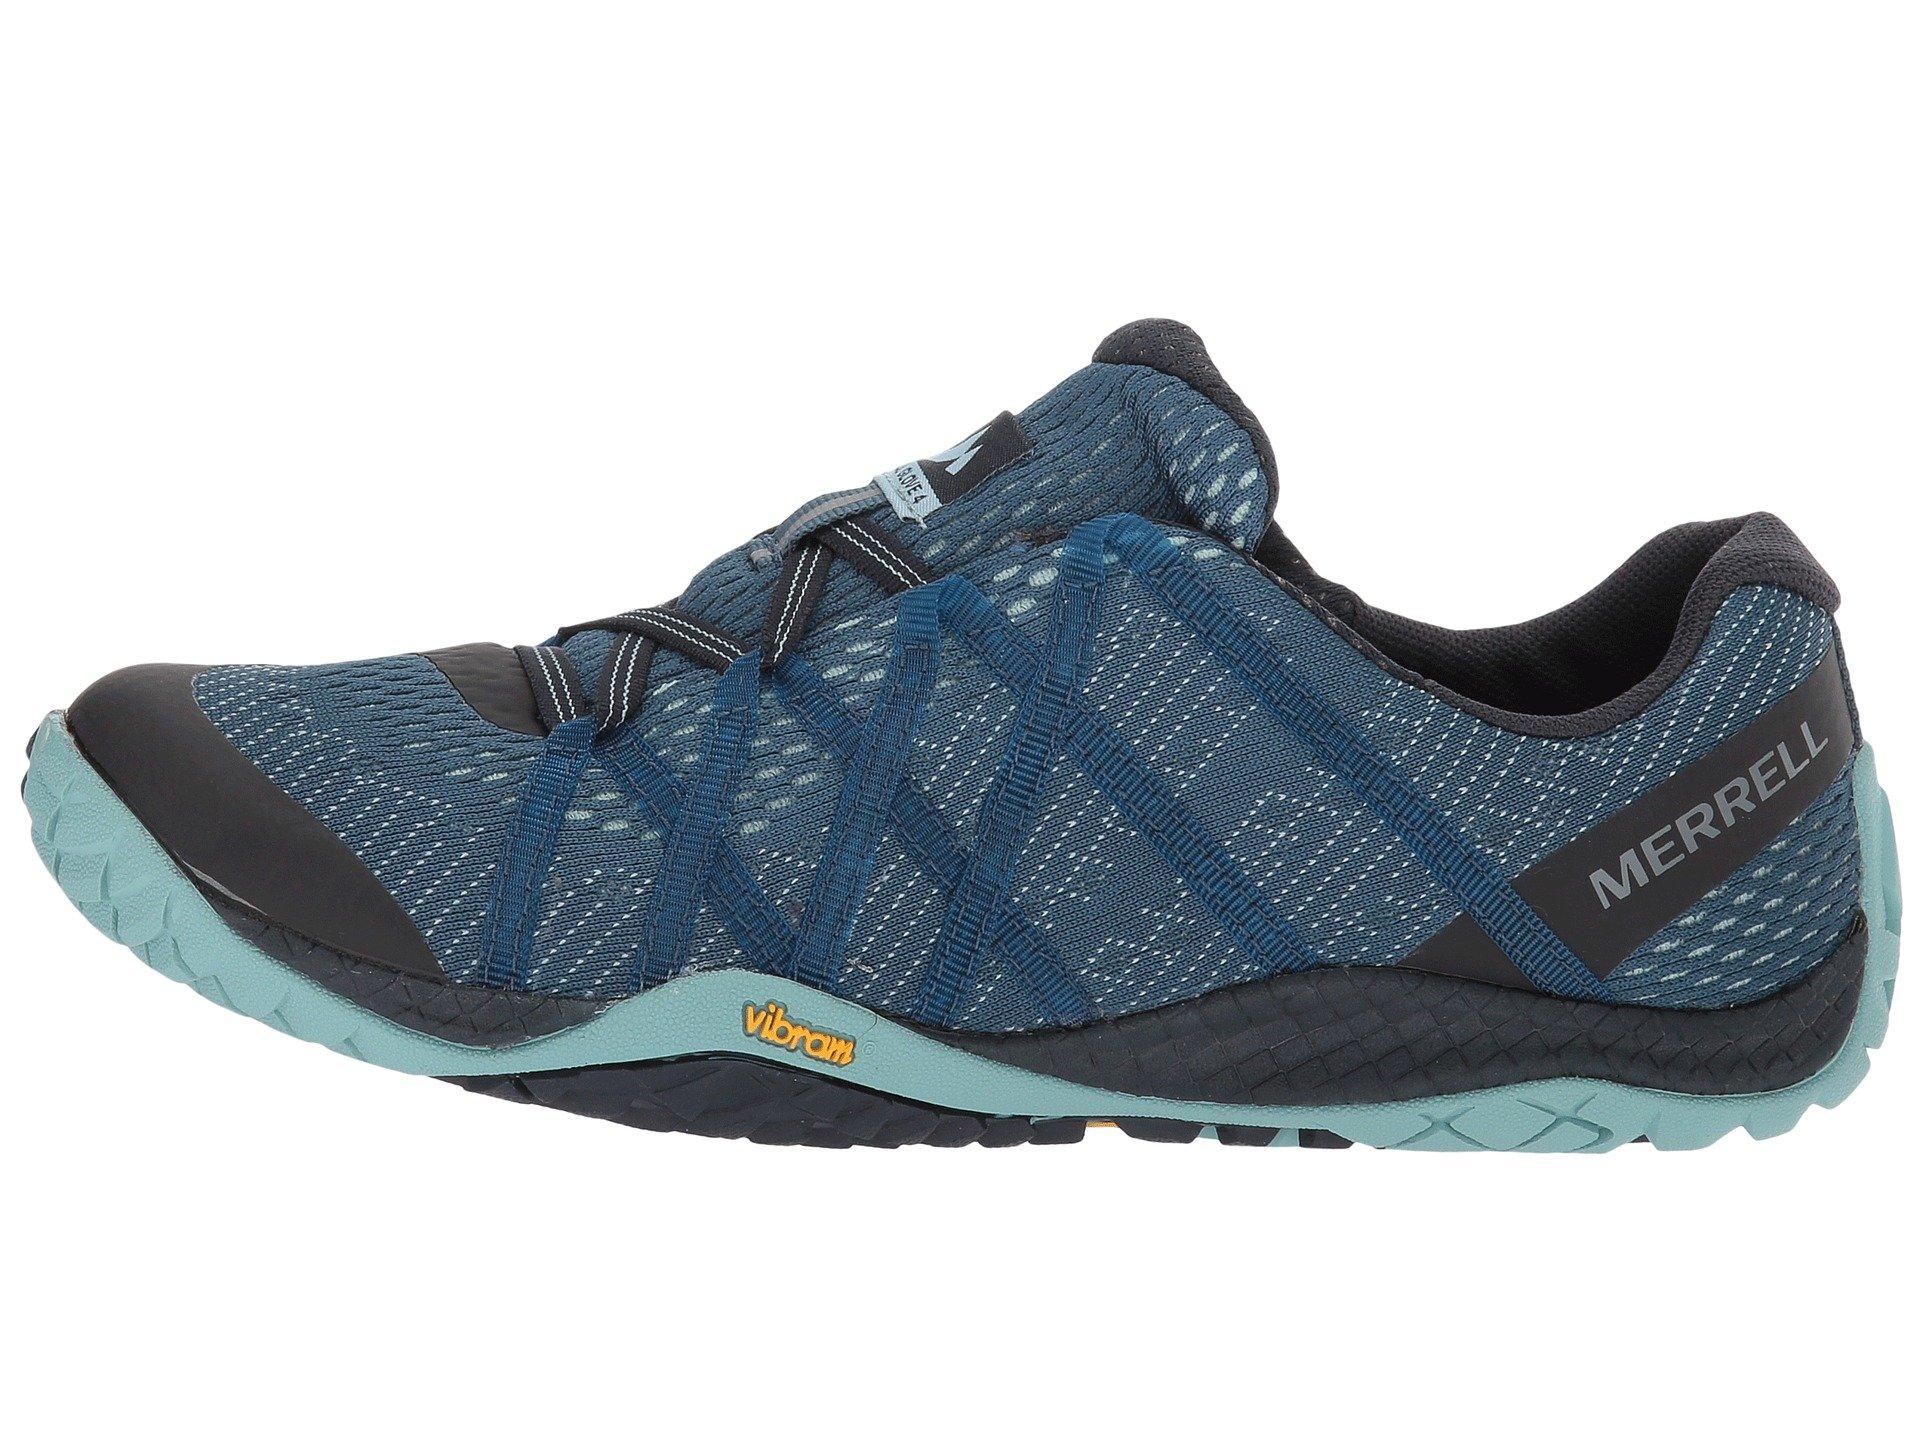 4 E Trail mesh Aqua Merrell Glove HPAUx4qF